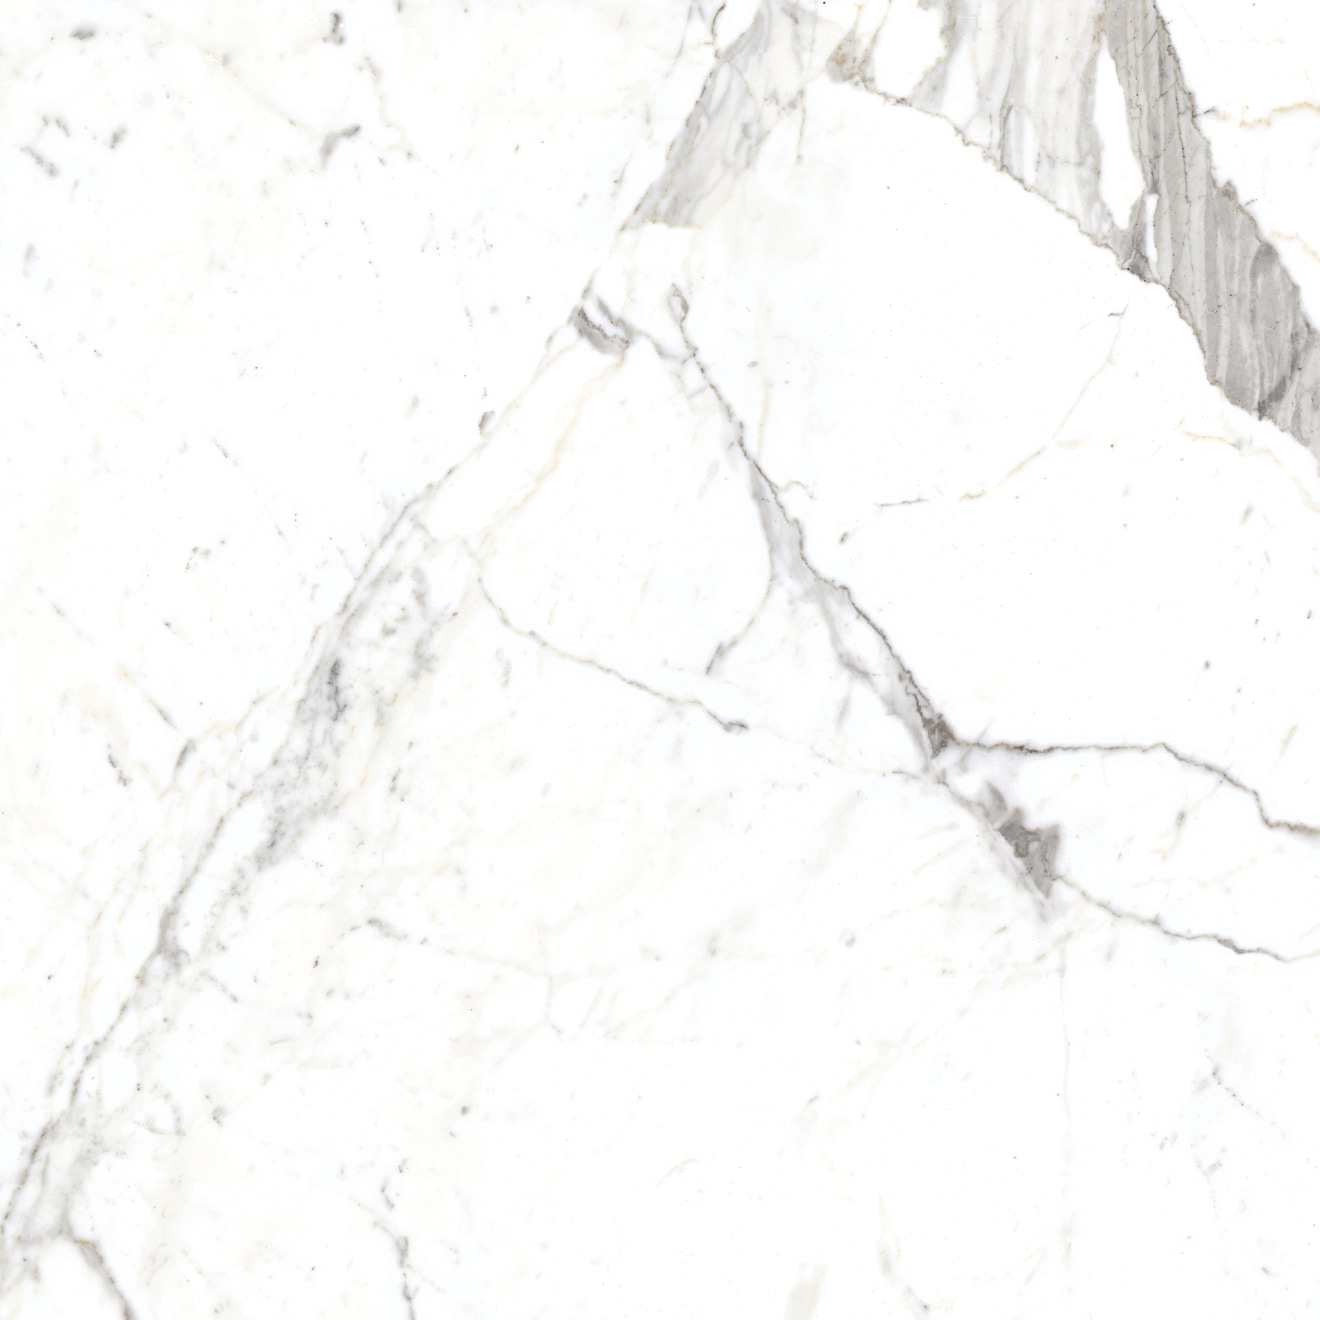 Magnifica 30 X 30 Floor Wall Tile In Statuarietto Bedrosians Tile Stone